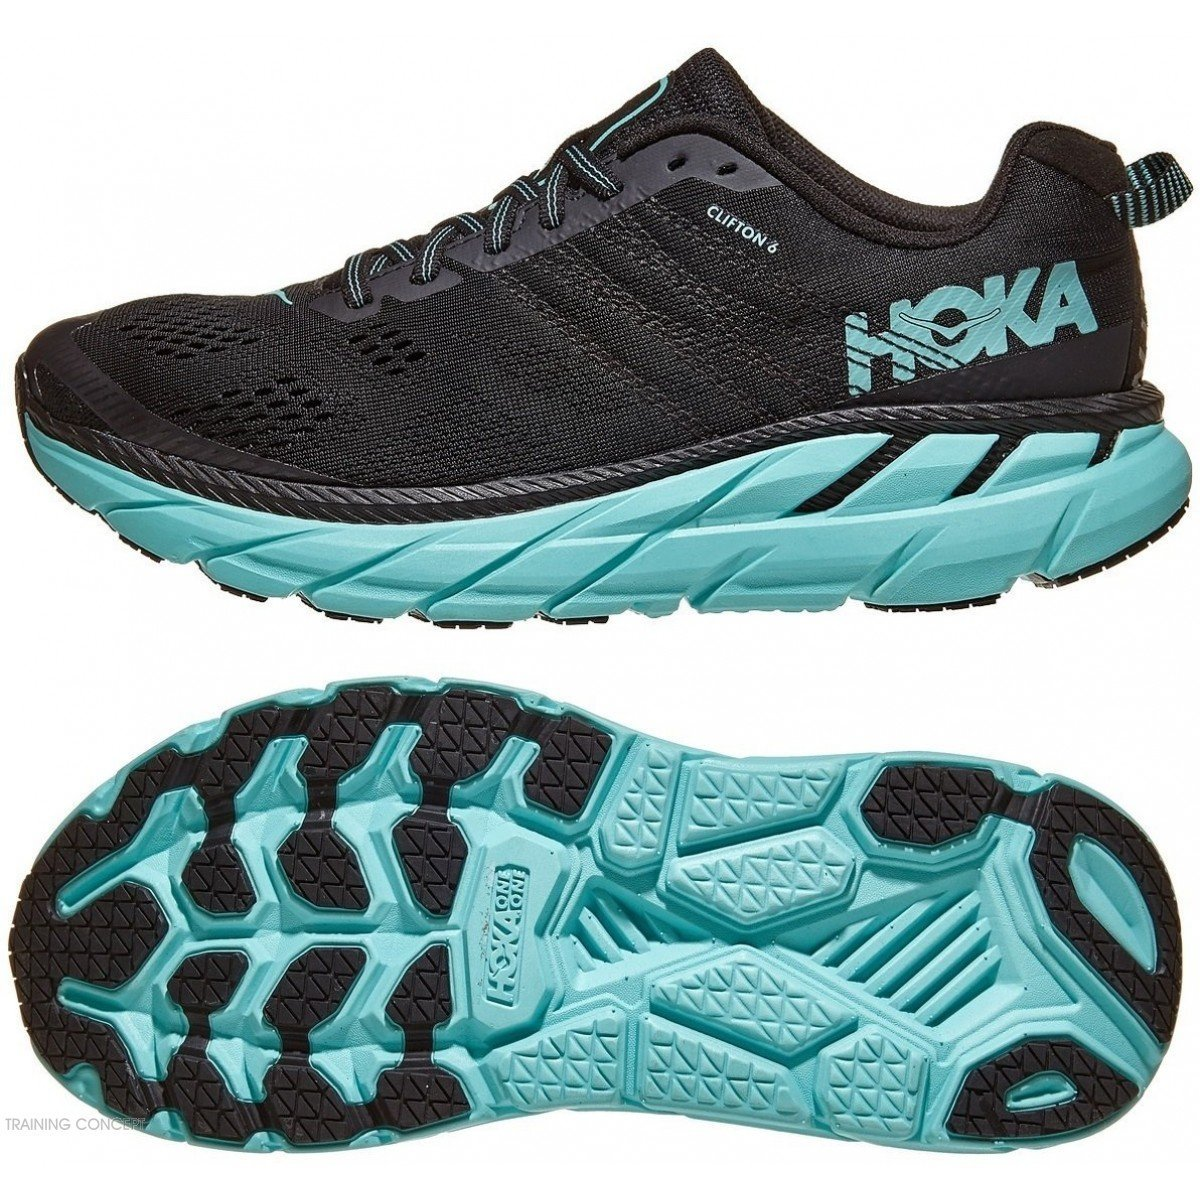 authentic discount shop famous brand chaussure de running pour femme hoka clifton 6 1102873 basy ...